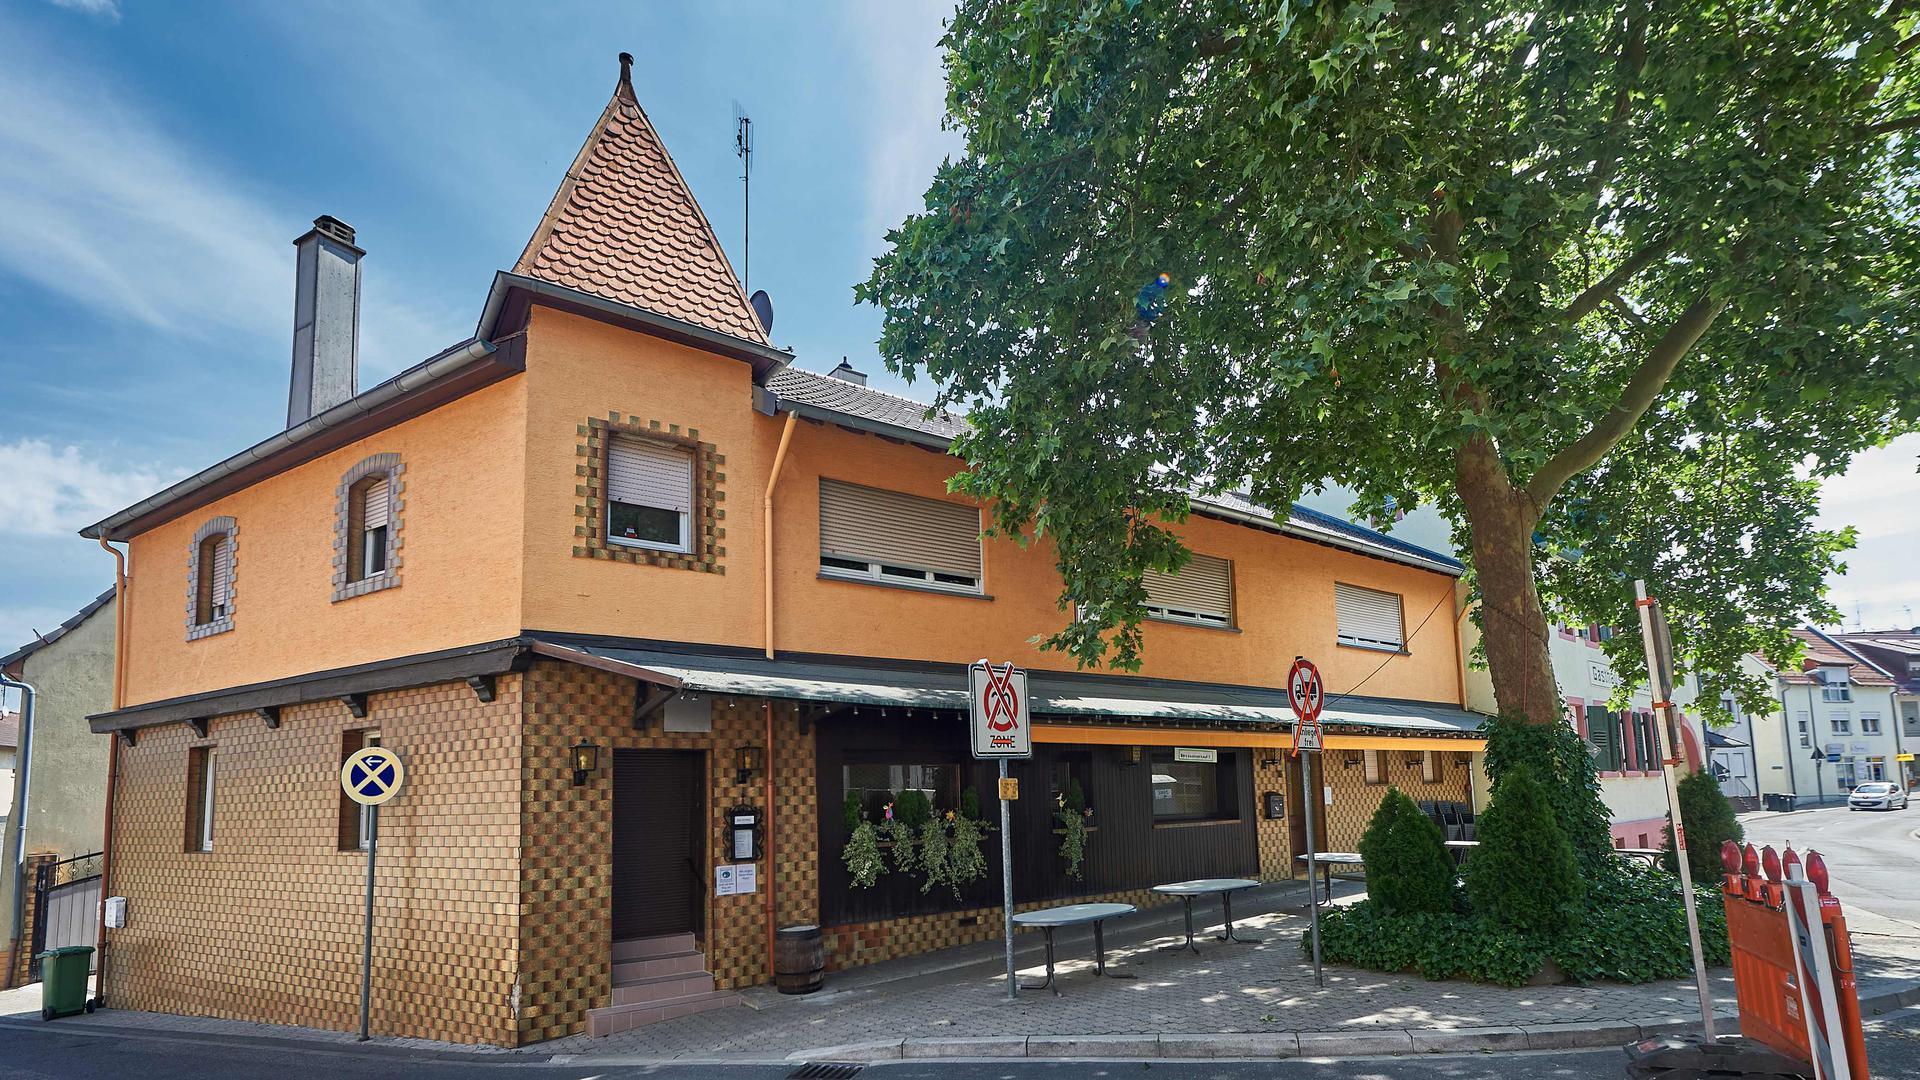 Strohhut Heidelsheim